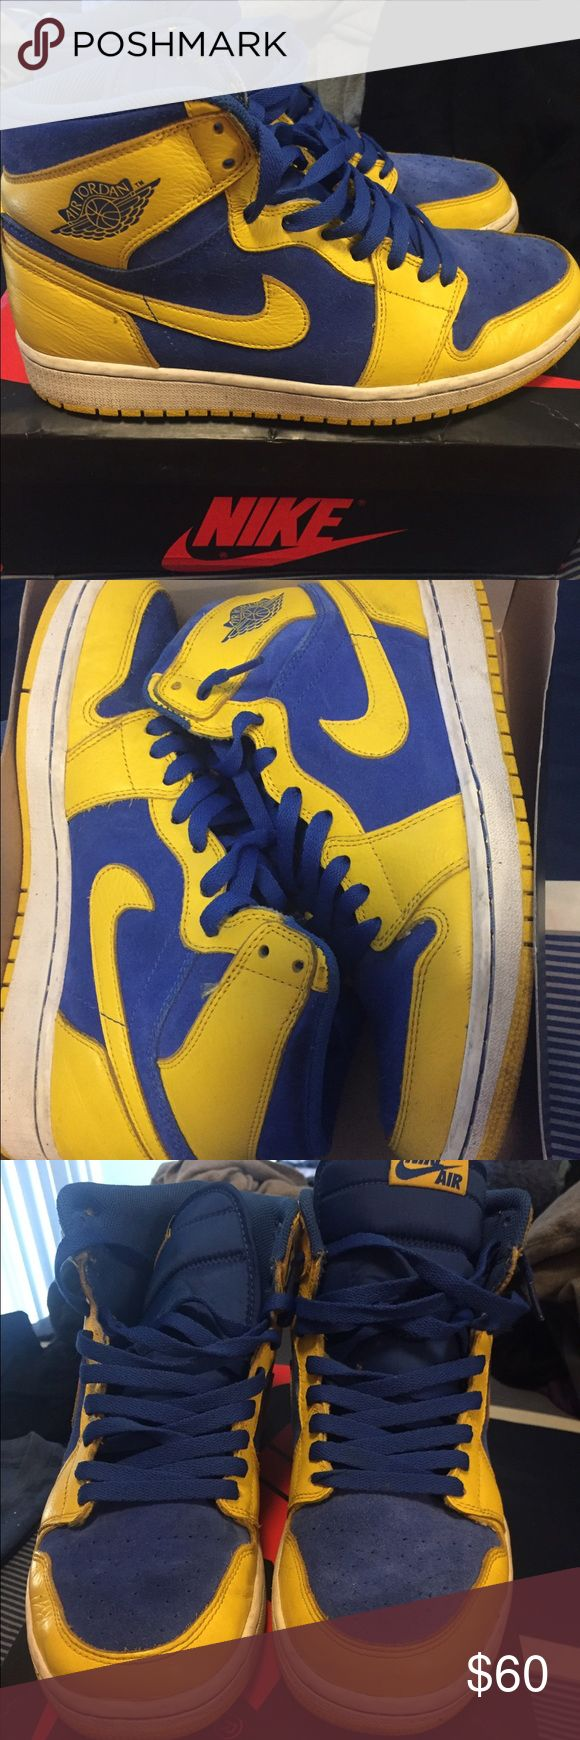 Jordan Retro 1's Air Jordan one retros for men size 9. Golden state warrior colors. High ogs Nike Shoes Athletic Shoes